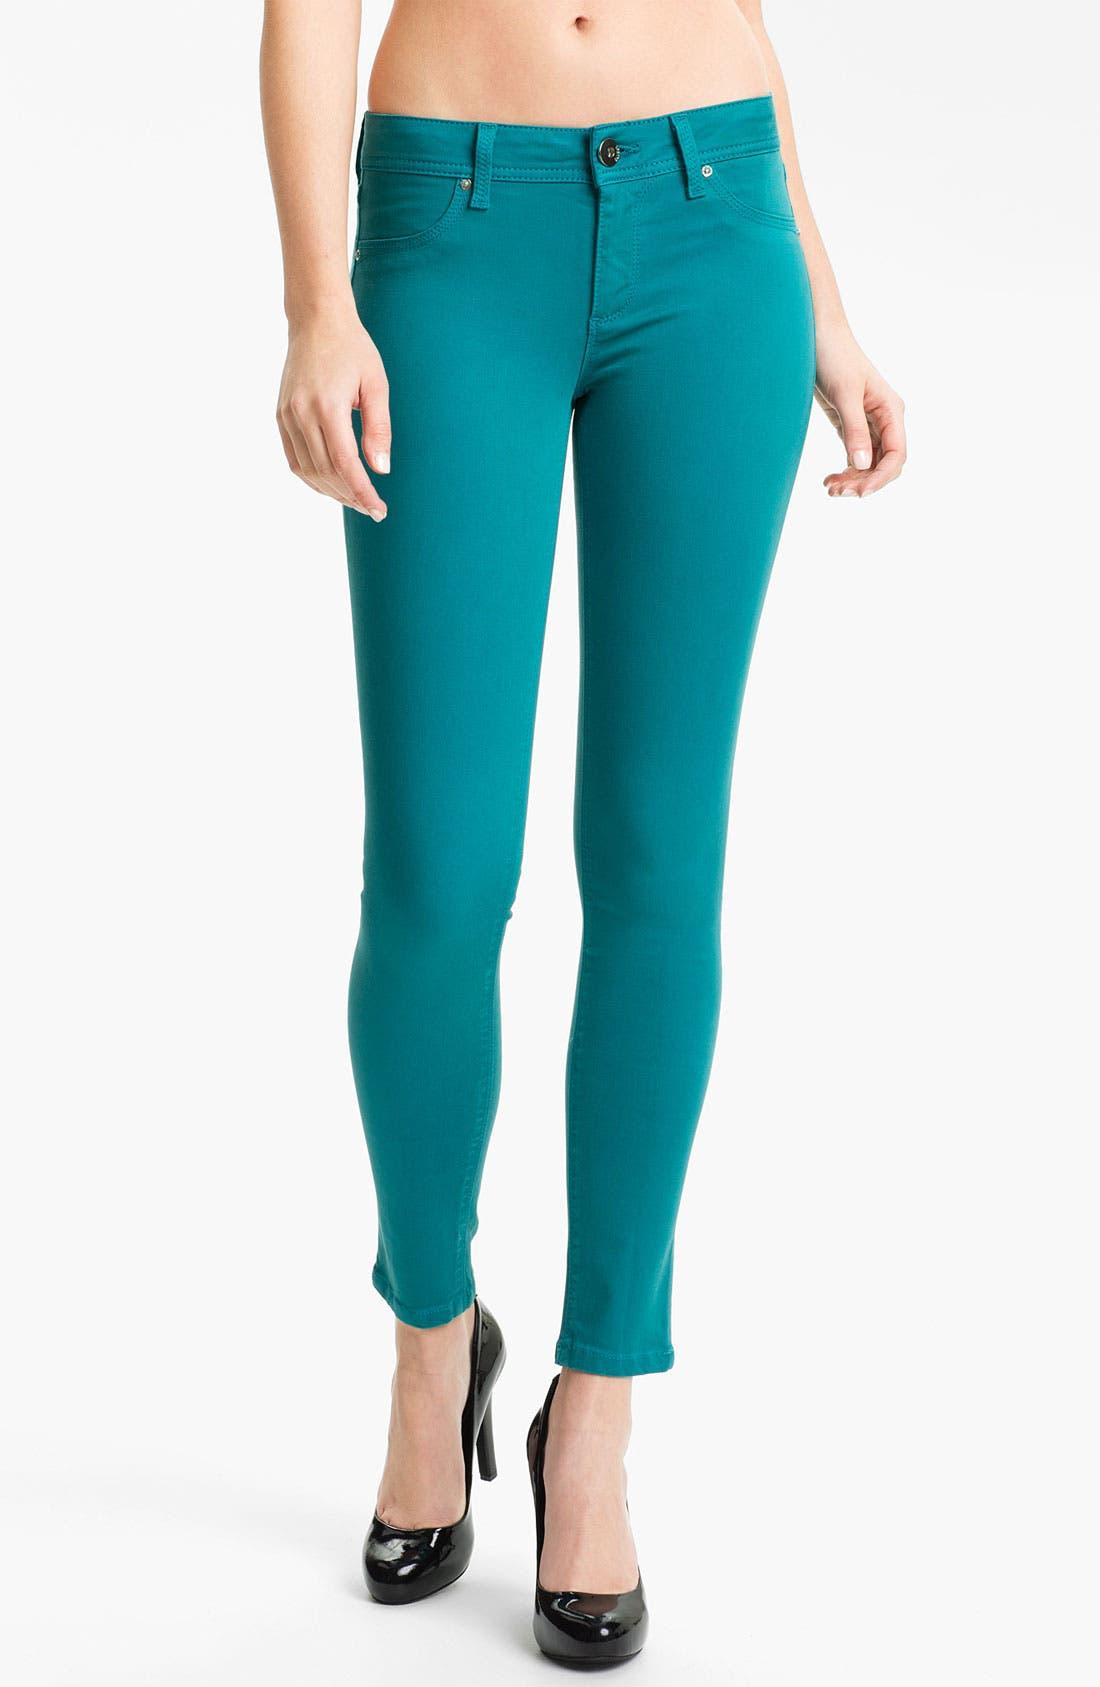 Alternate Image 1 Selected - DL1961 'Emma' X-Fit Stretch Skinny Jeans (Aruba)